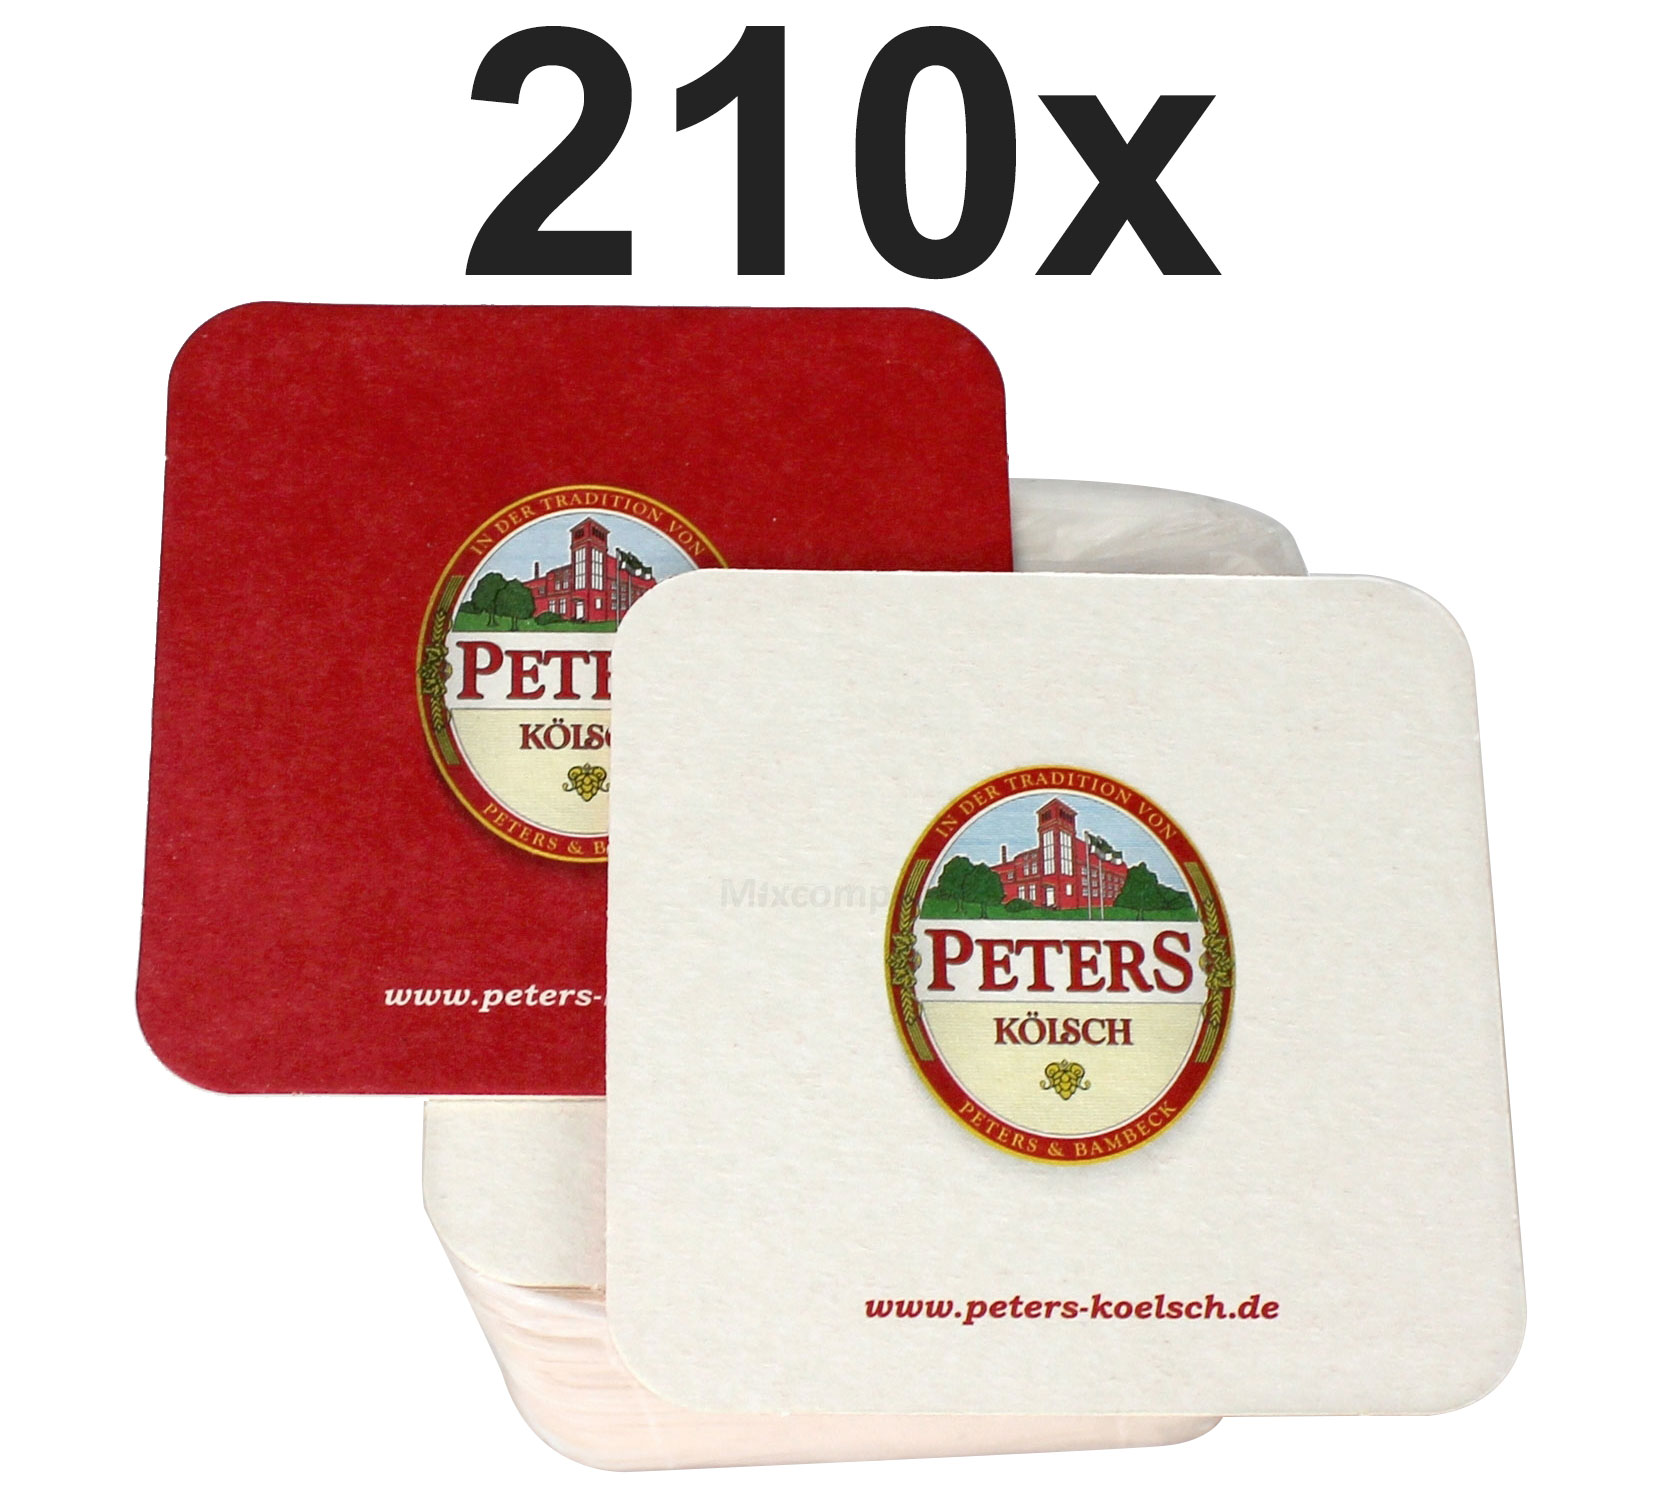 Peters Kölsch Bierdeckel Untersetzer Aktion - 210 Stück (3x 70er Packung)